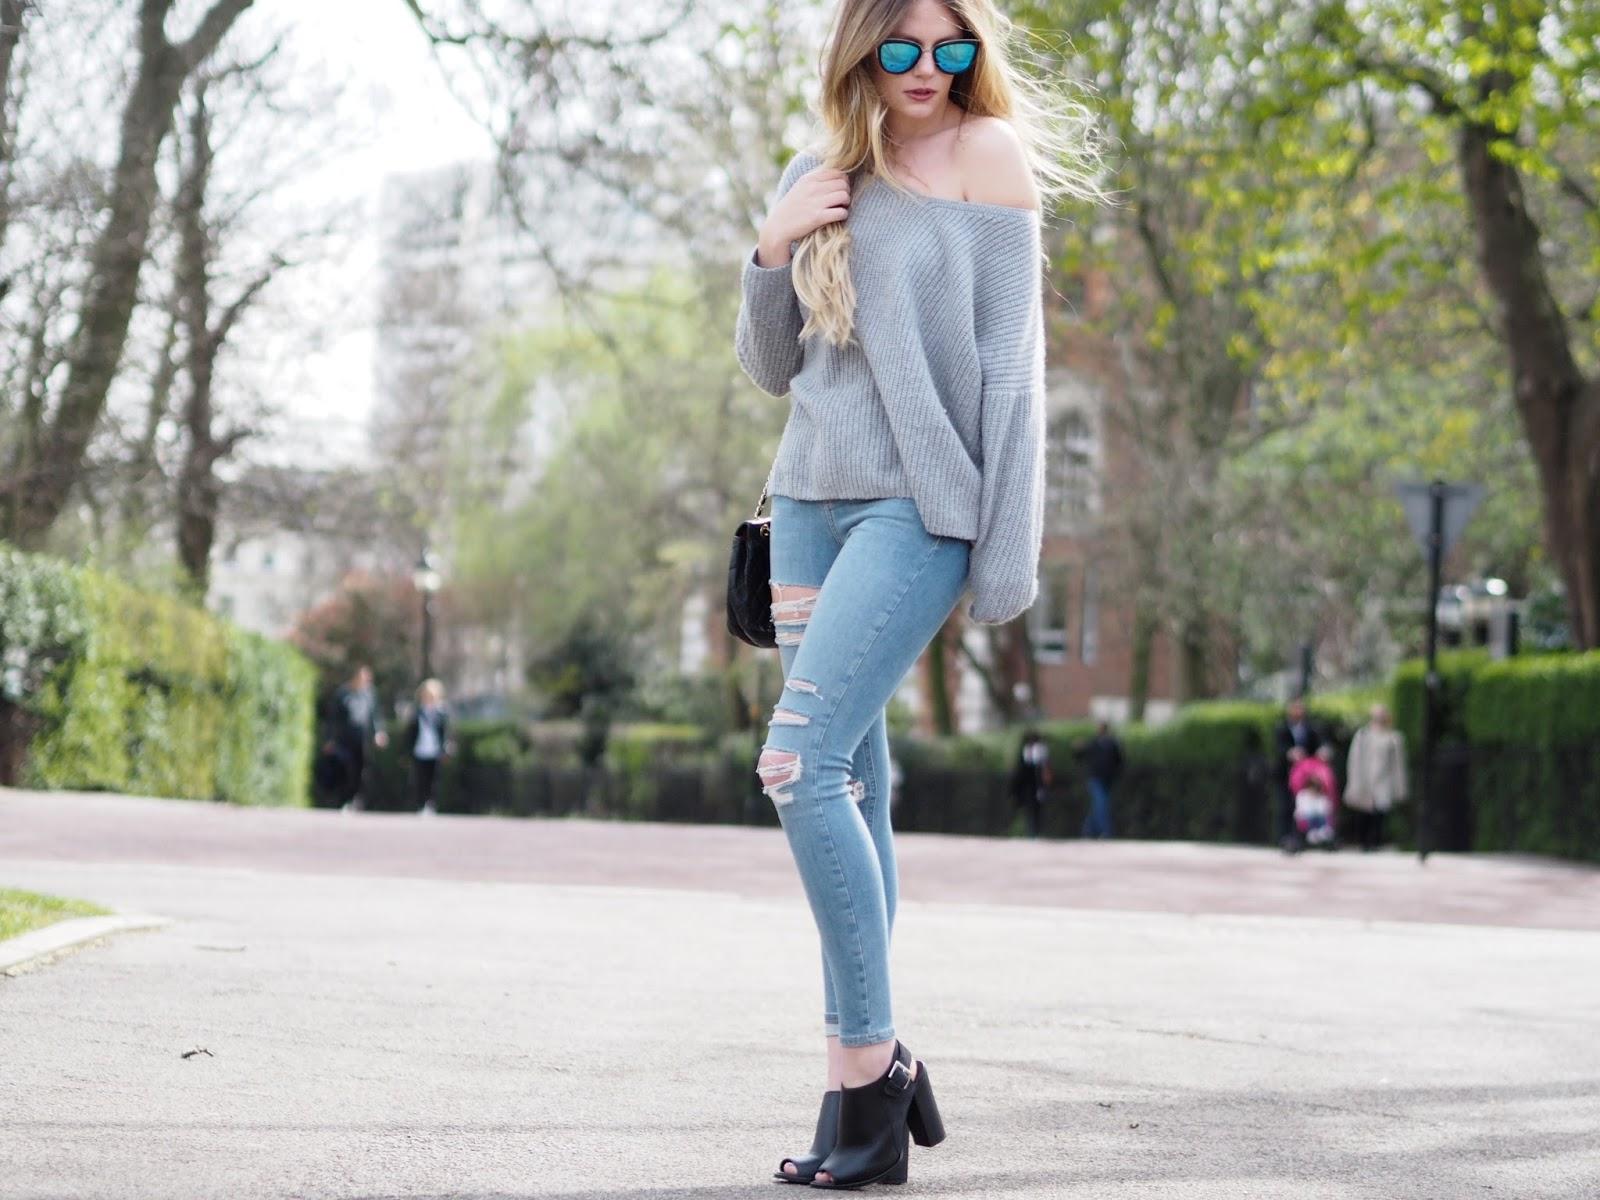 Dream basics – Jumper, Jeans & Chanel.